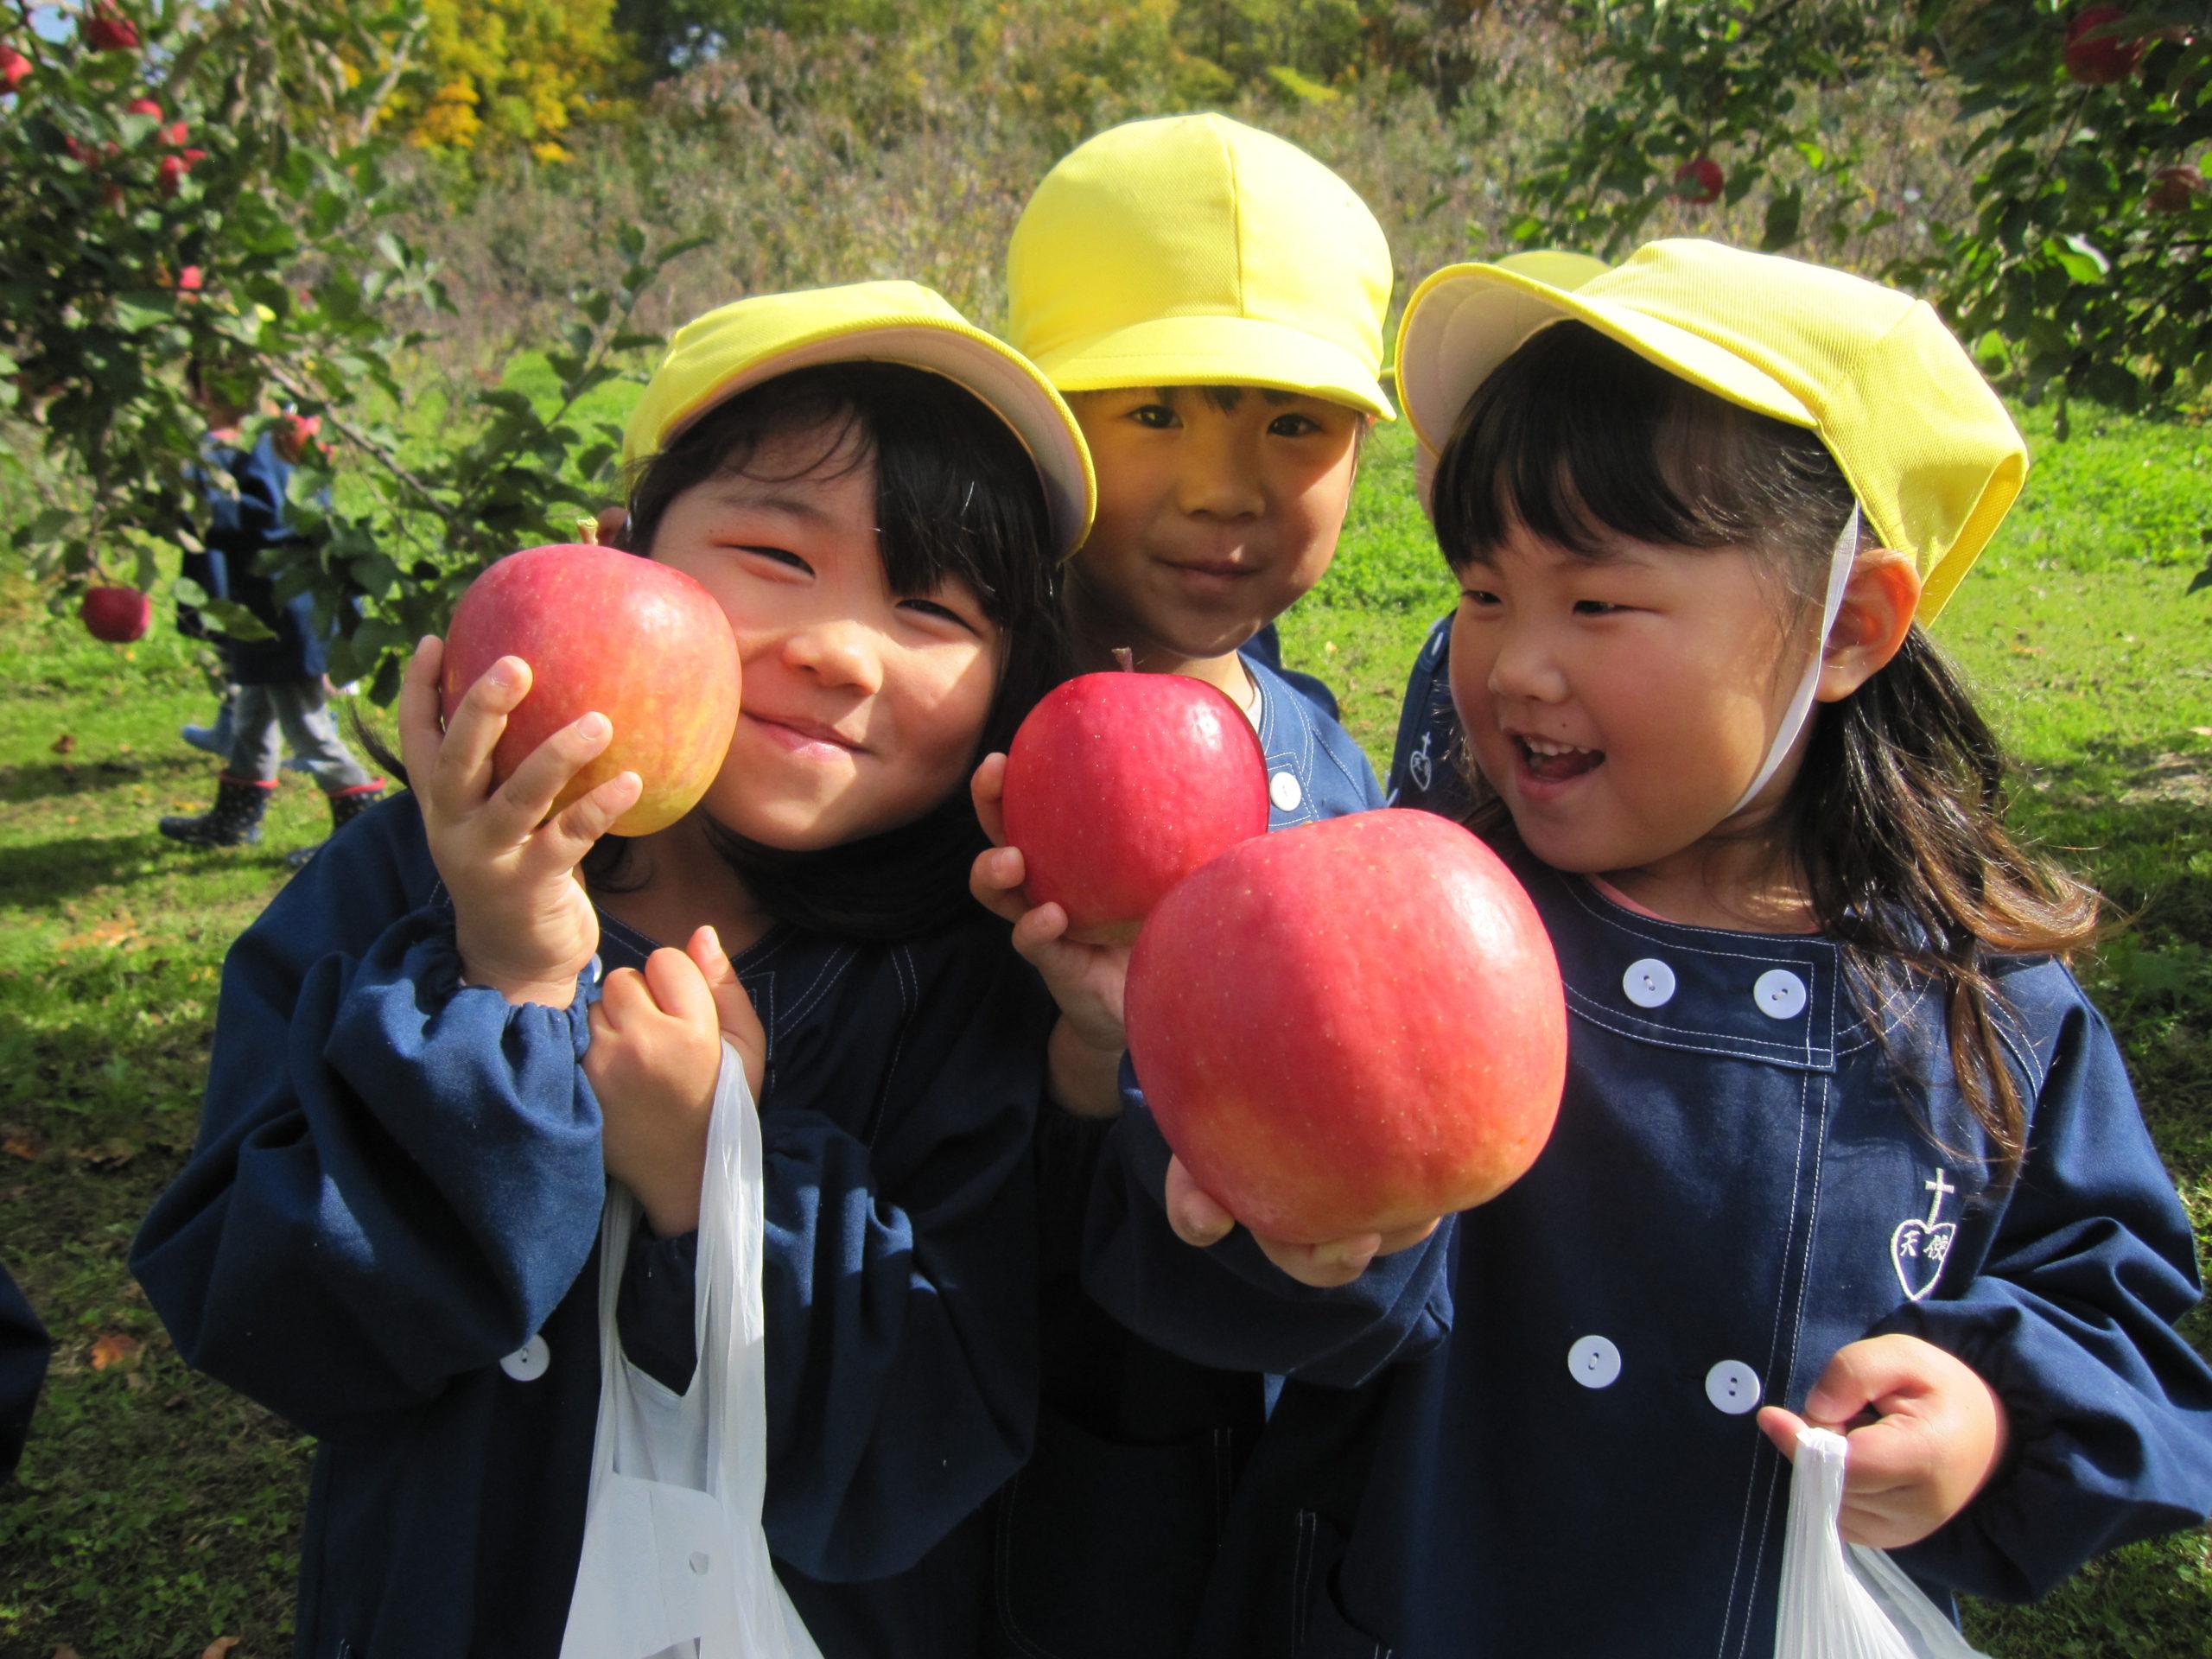 学校法人旭川カトリック学園 旭川天使幼稚園 画像2